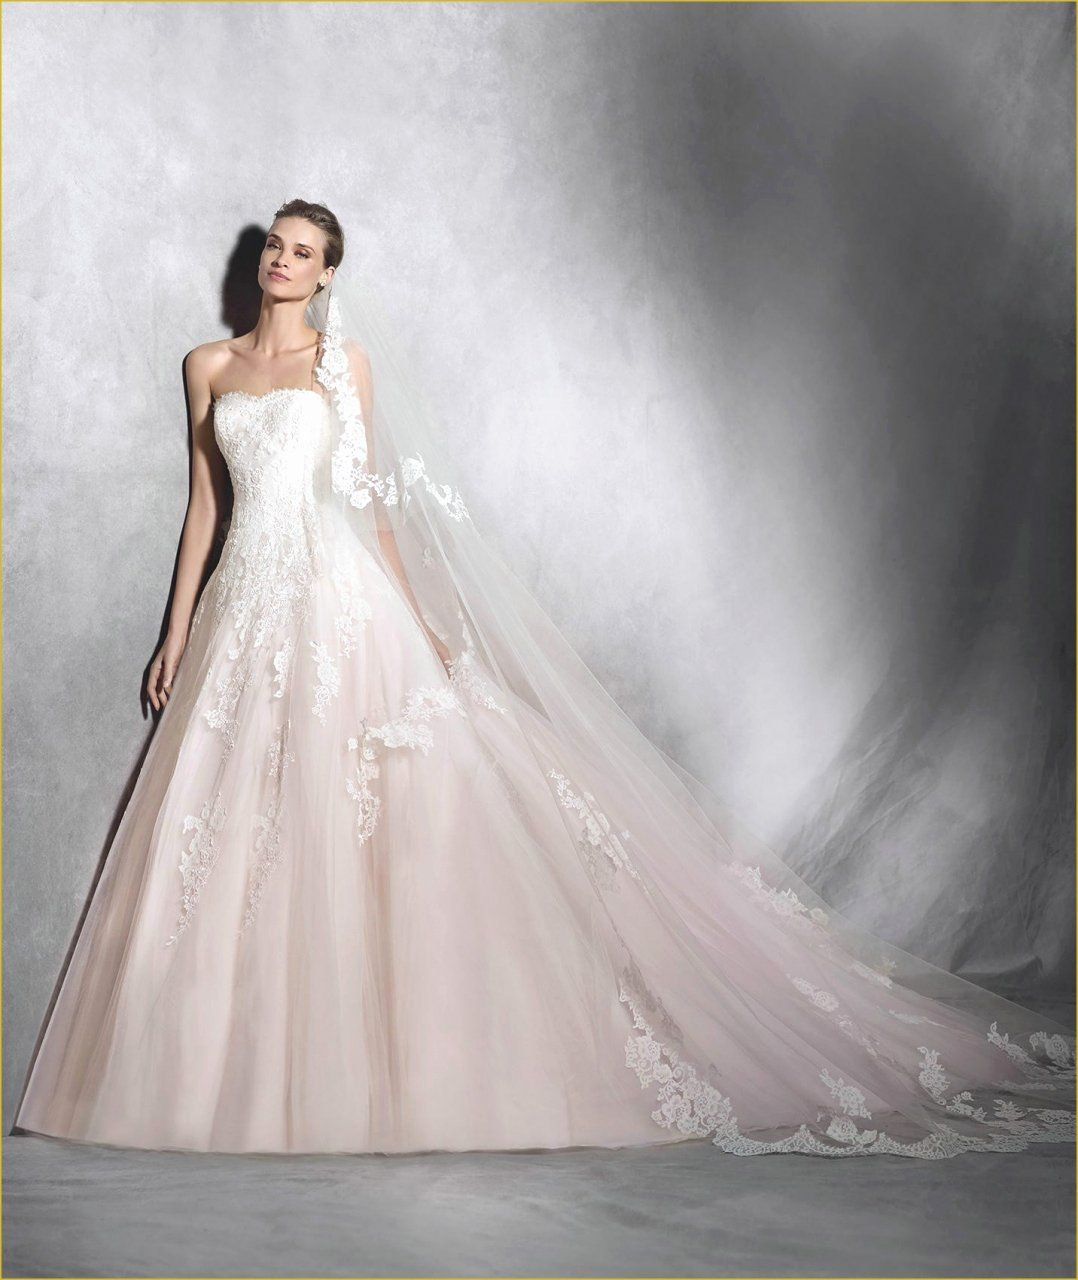 Wedding Dress Las Vegas Rent Best Of 55 Elegant Wedding Dress Rentals Las Vegas In 2020 Vegas Wedding Dress Las Vegas Wedding Dresses Las Vegas Wedding Dress Rental